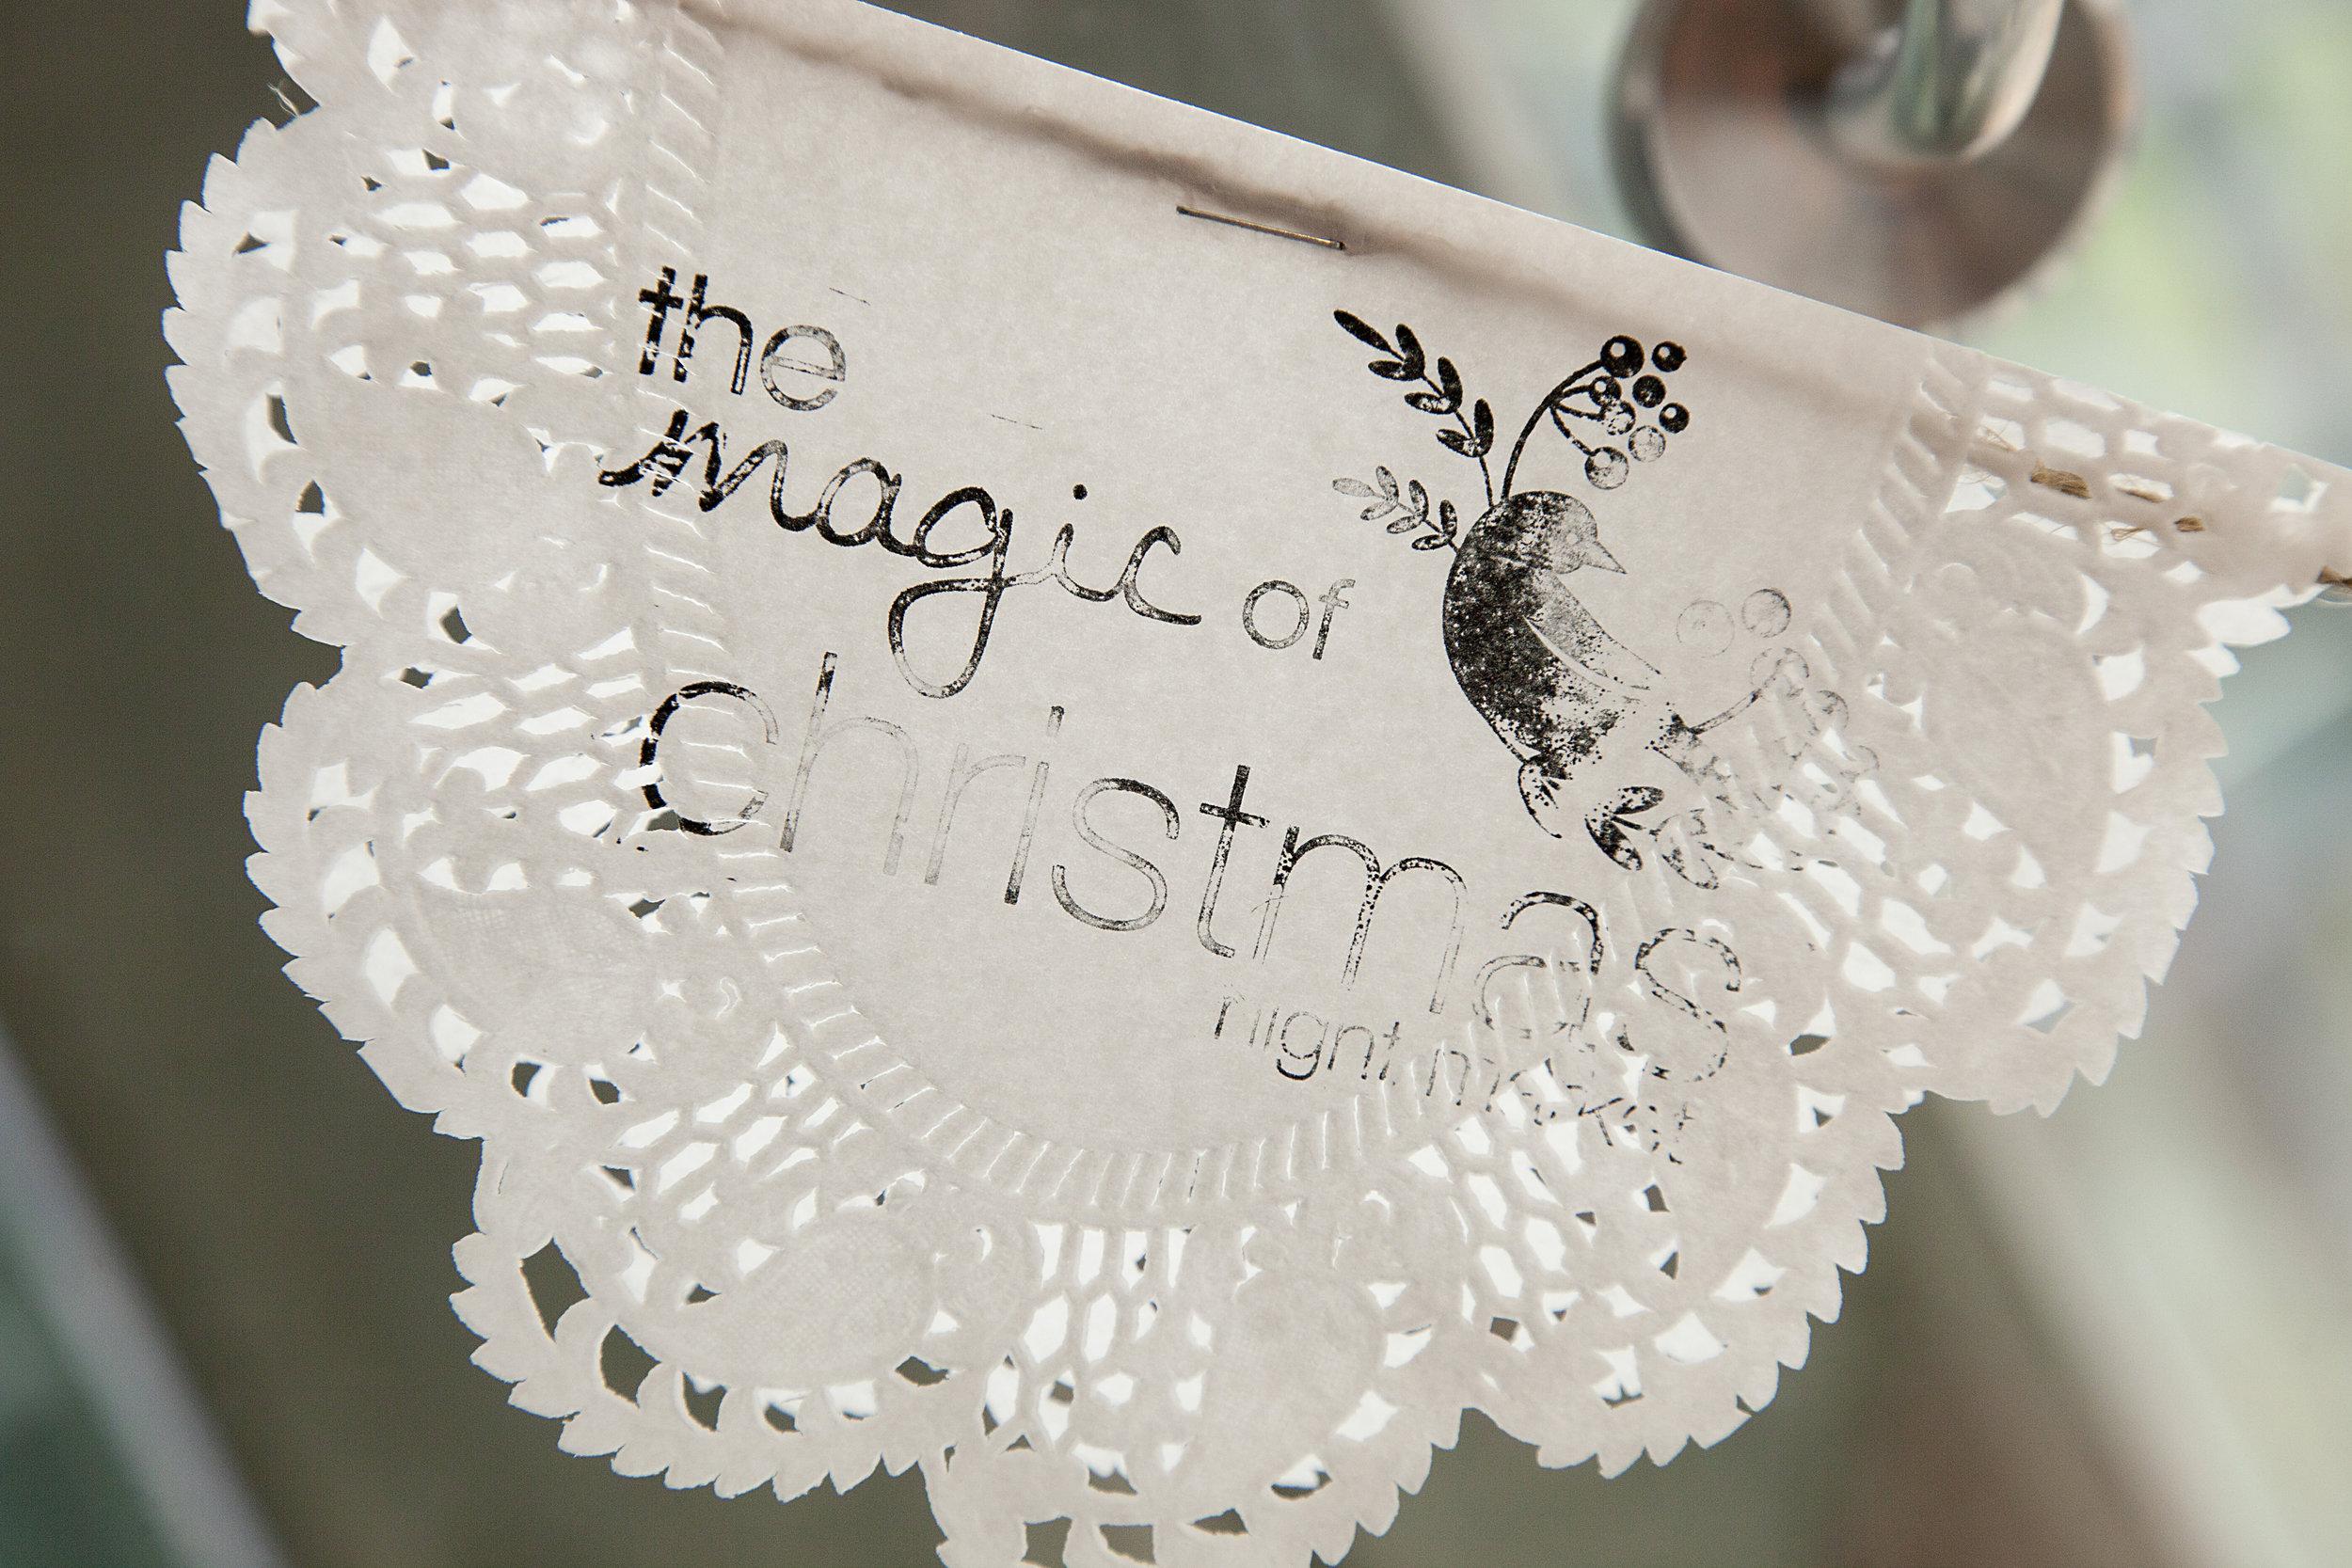 Magic of Christmas 001.jpg